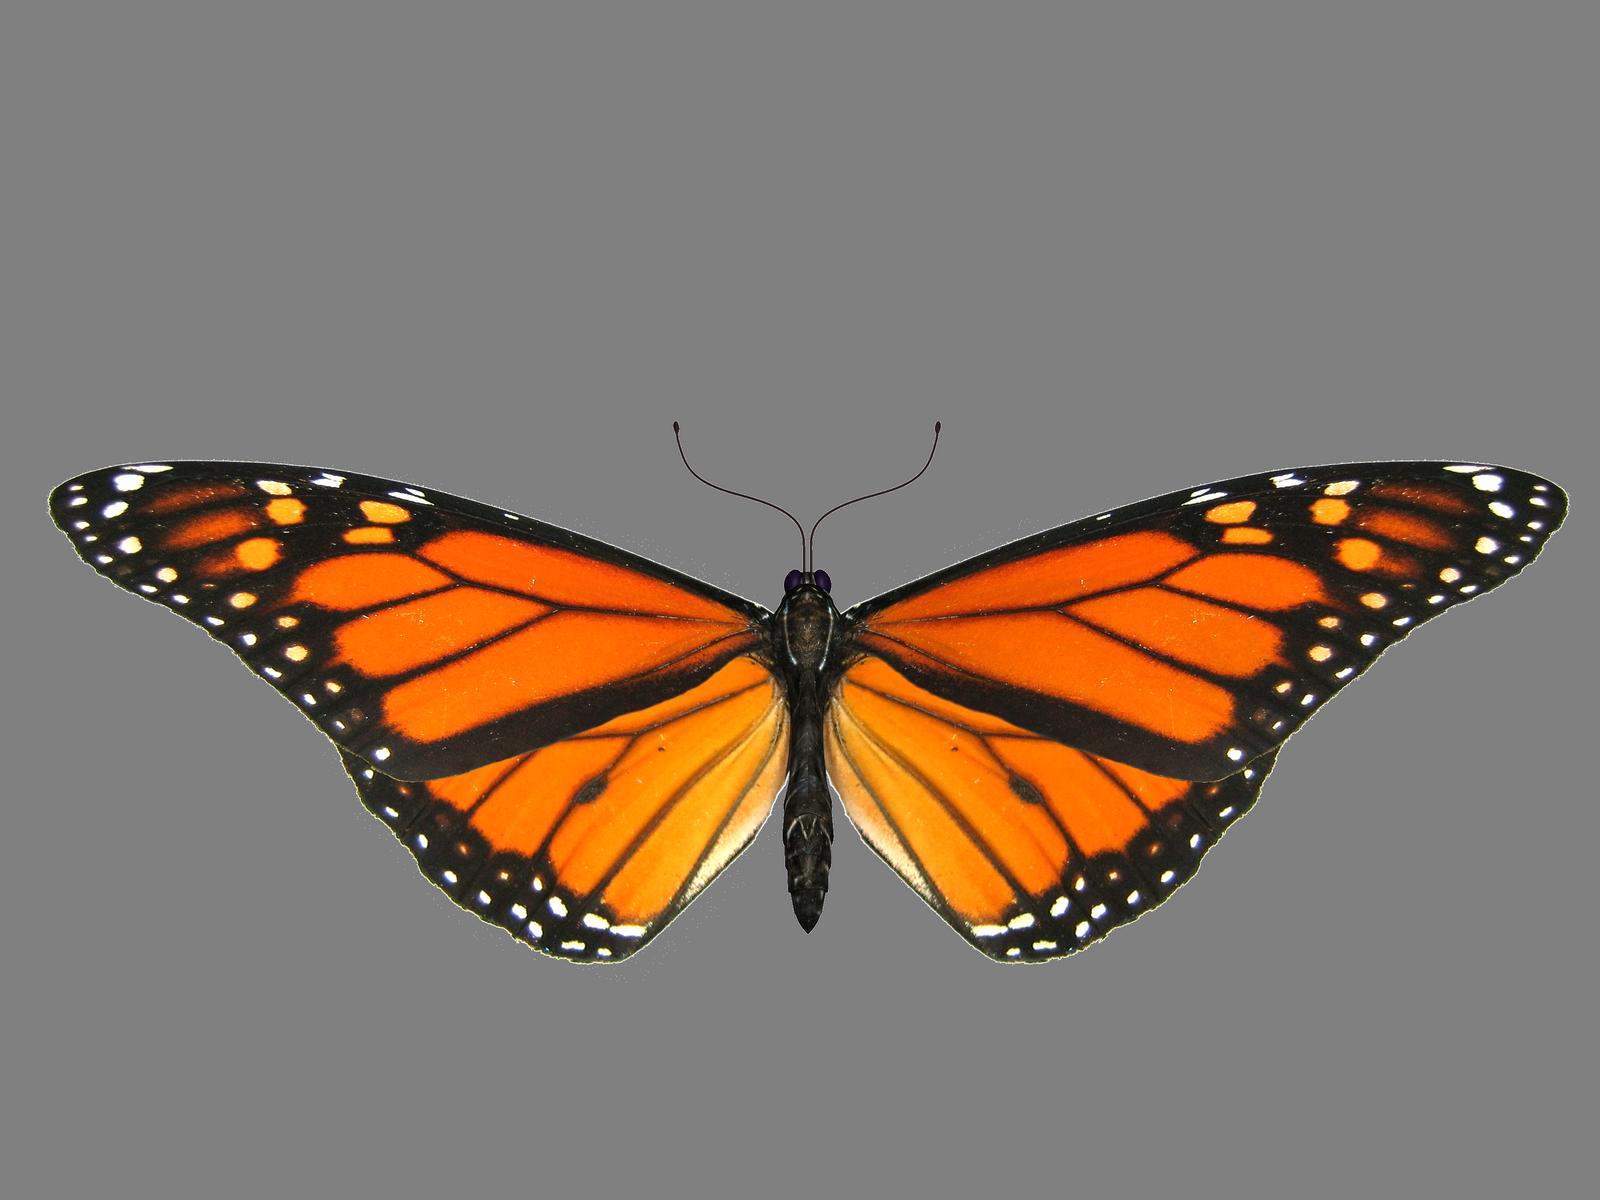 Butterfly Png Image Butterfly Png Images Png